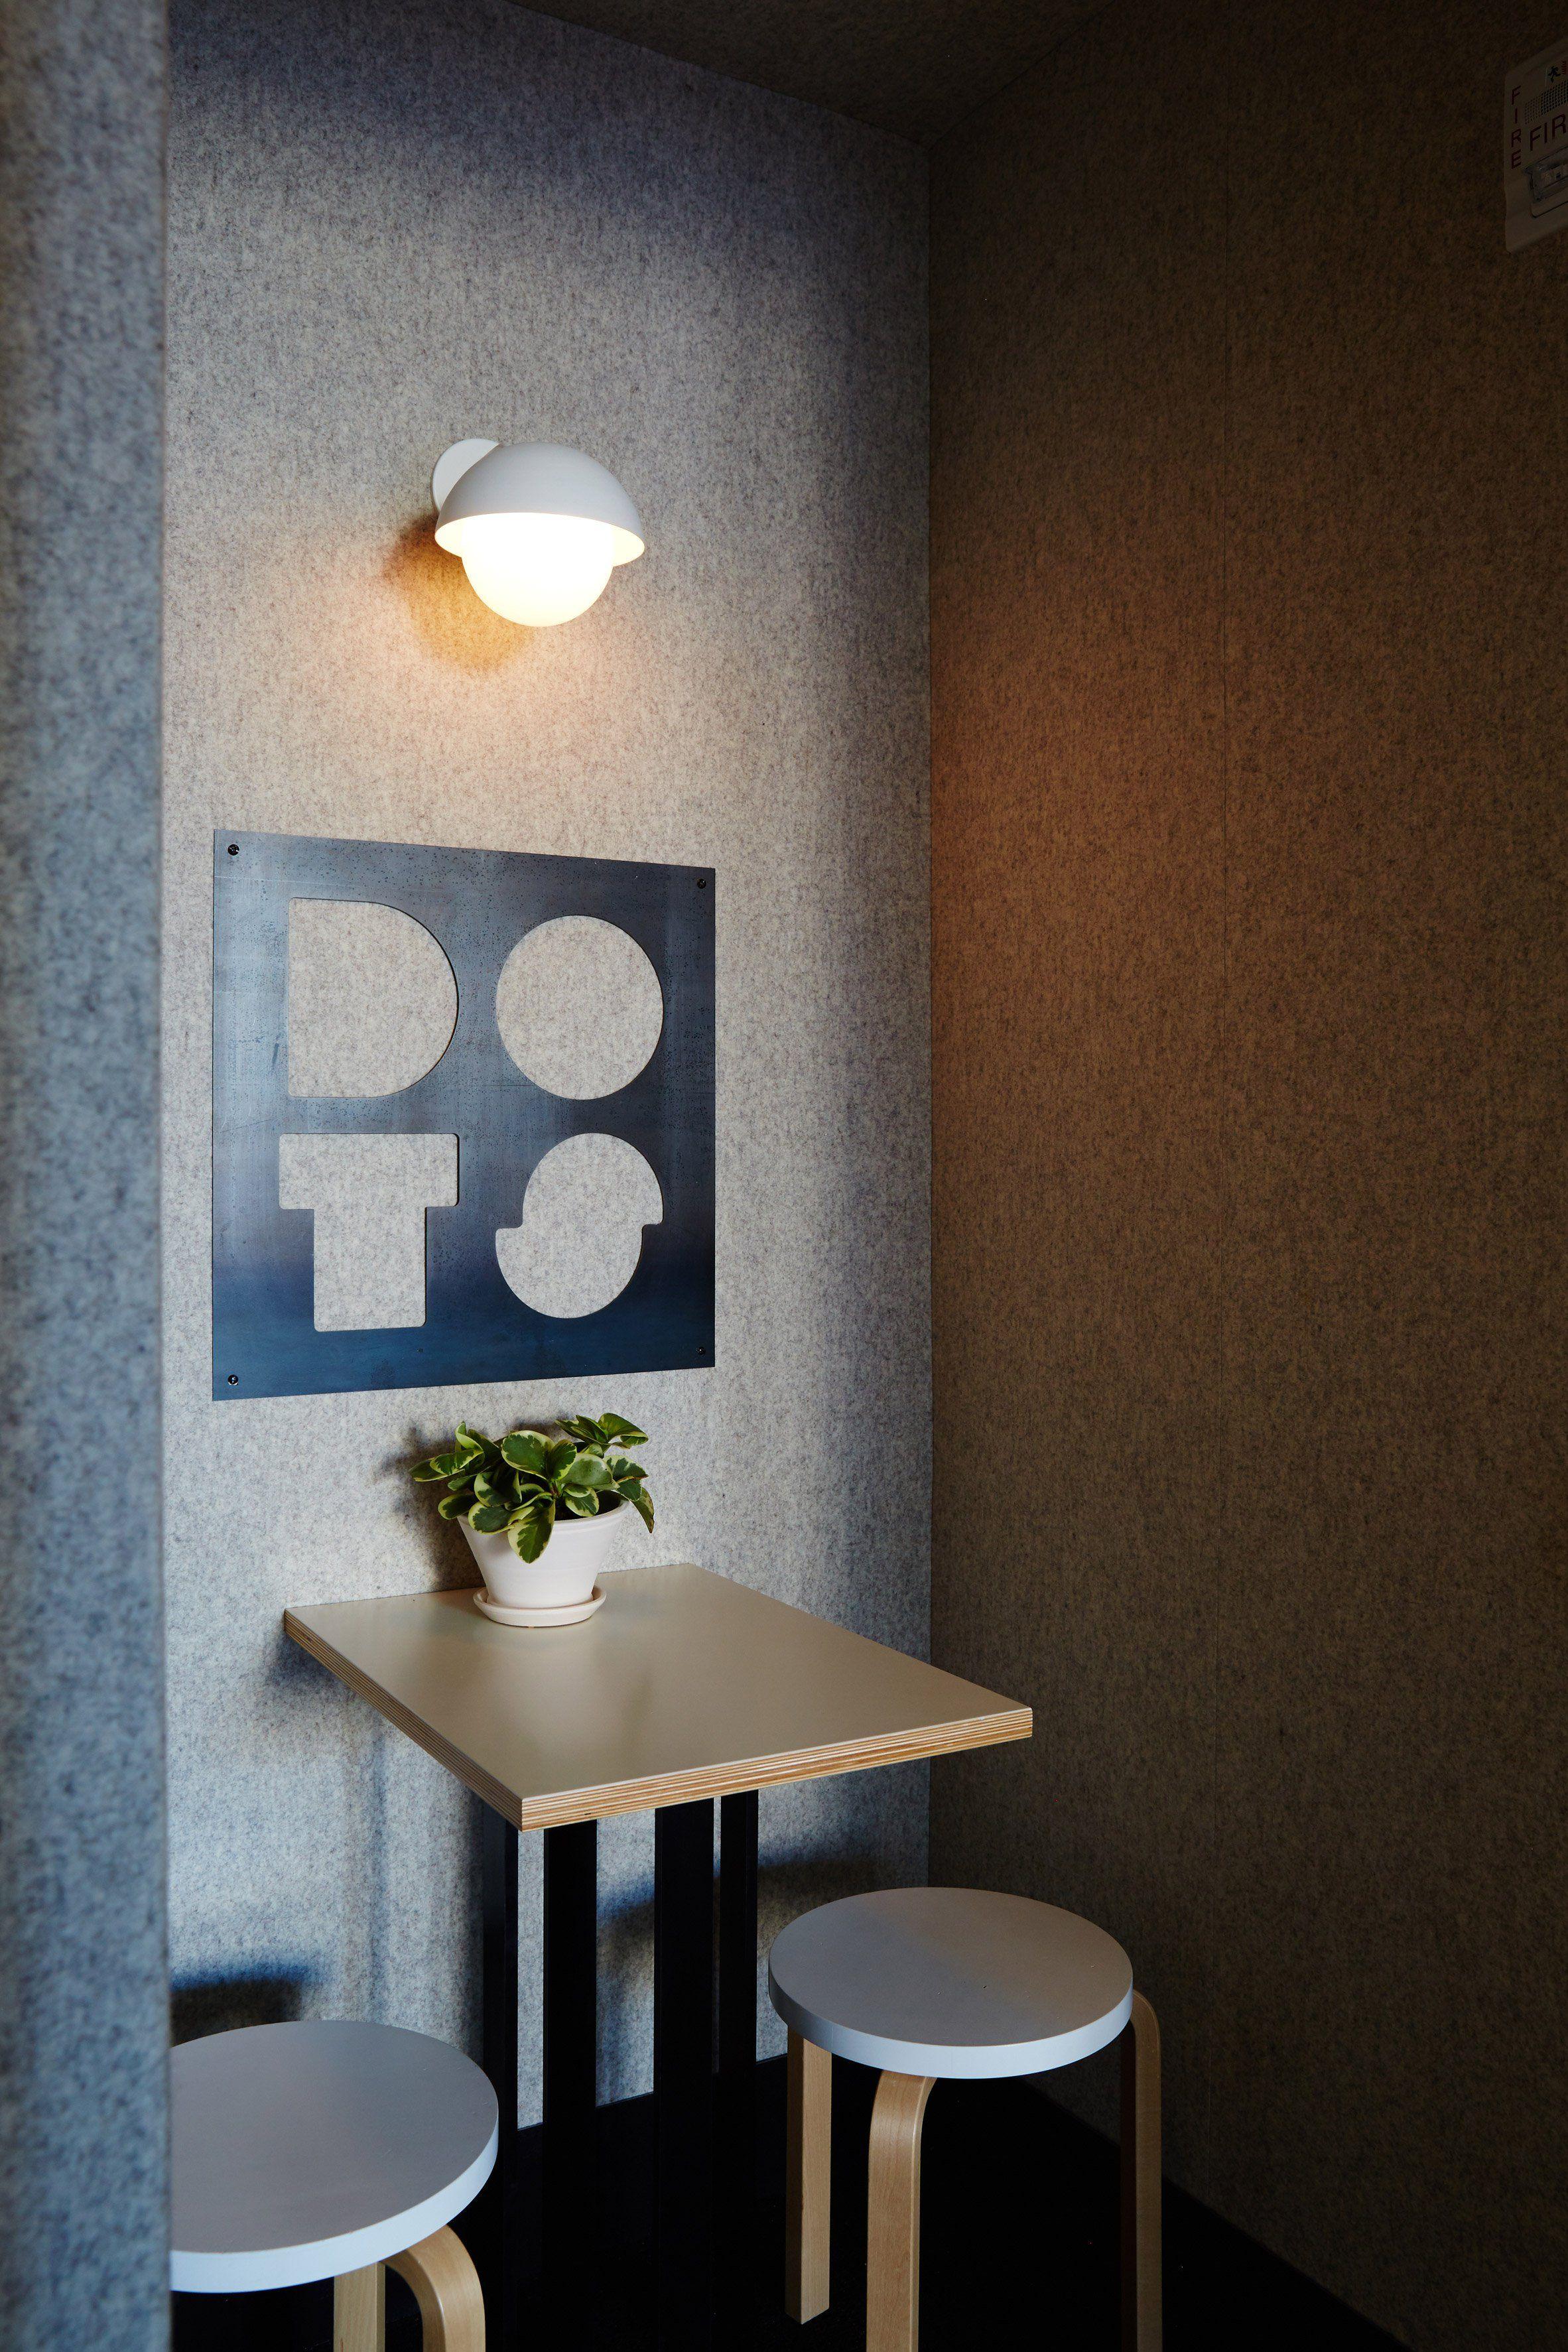 Dots Office Favorite Places And Spaces Pinterest Buero